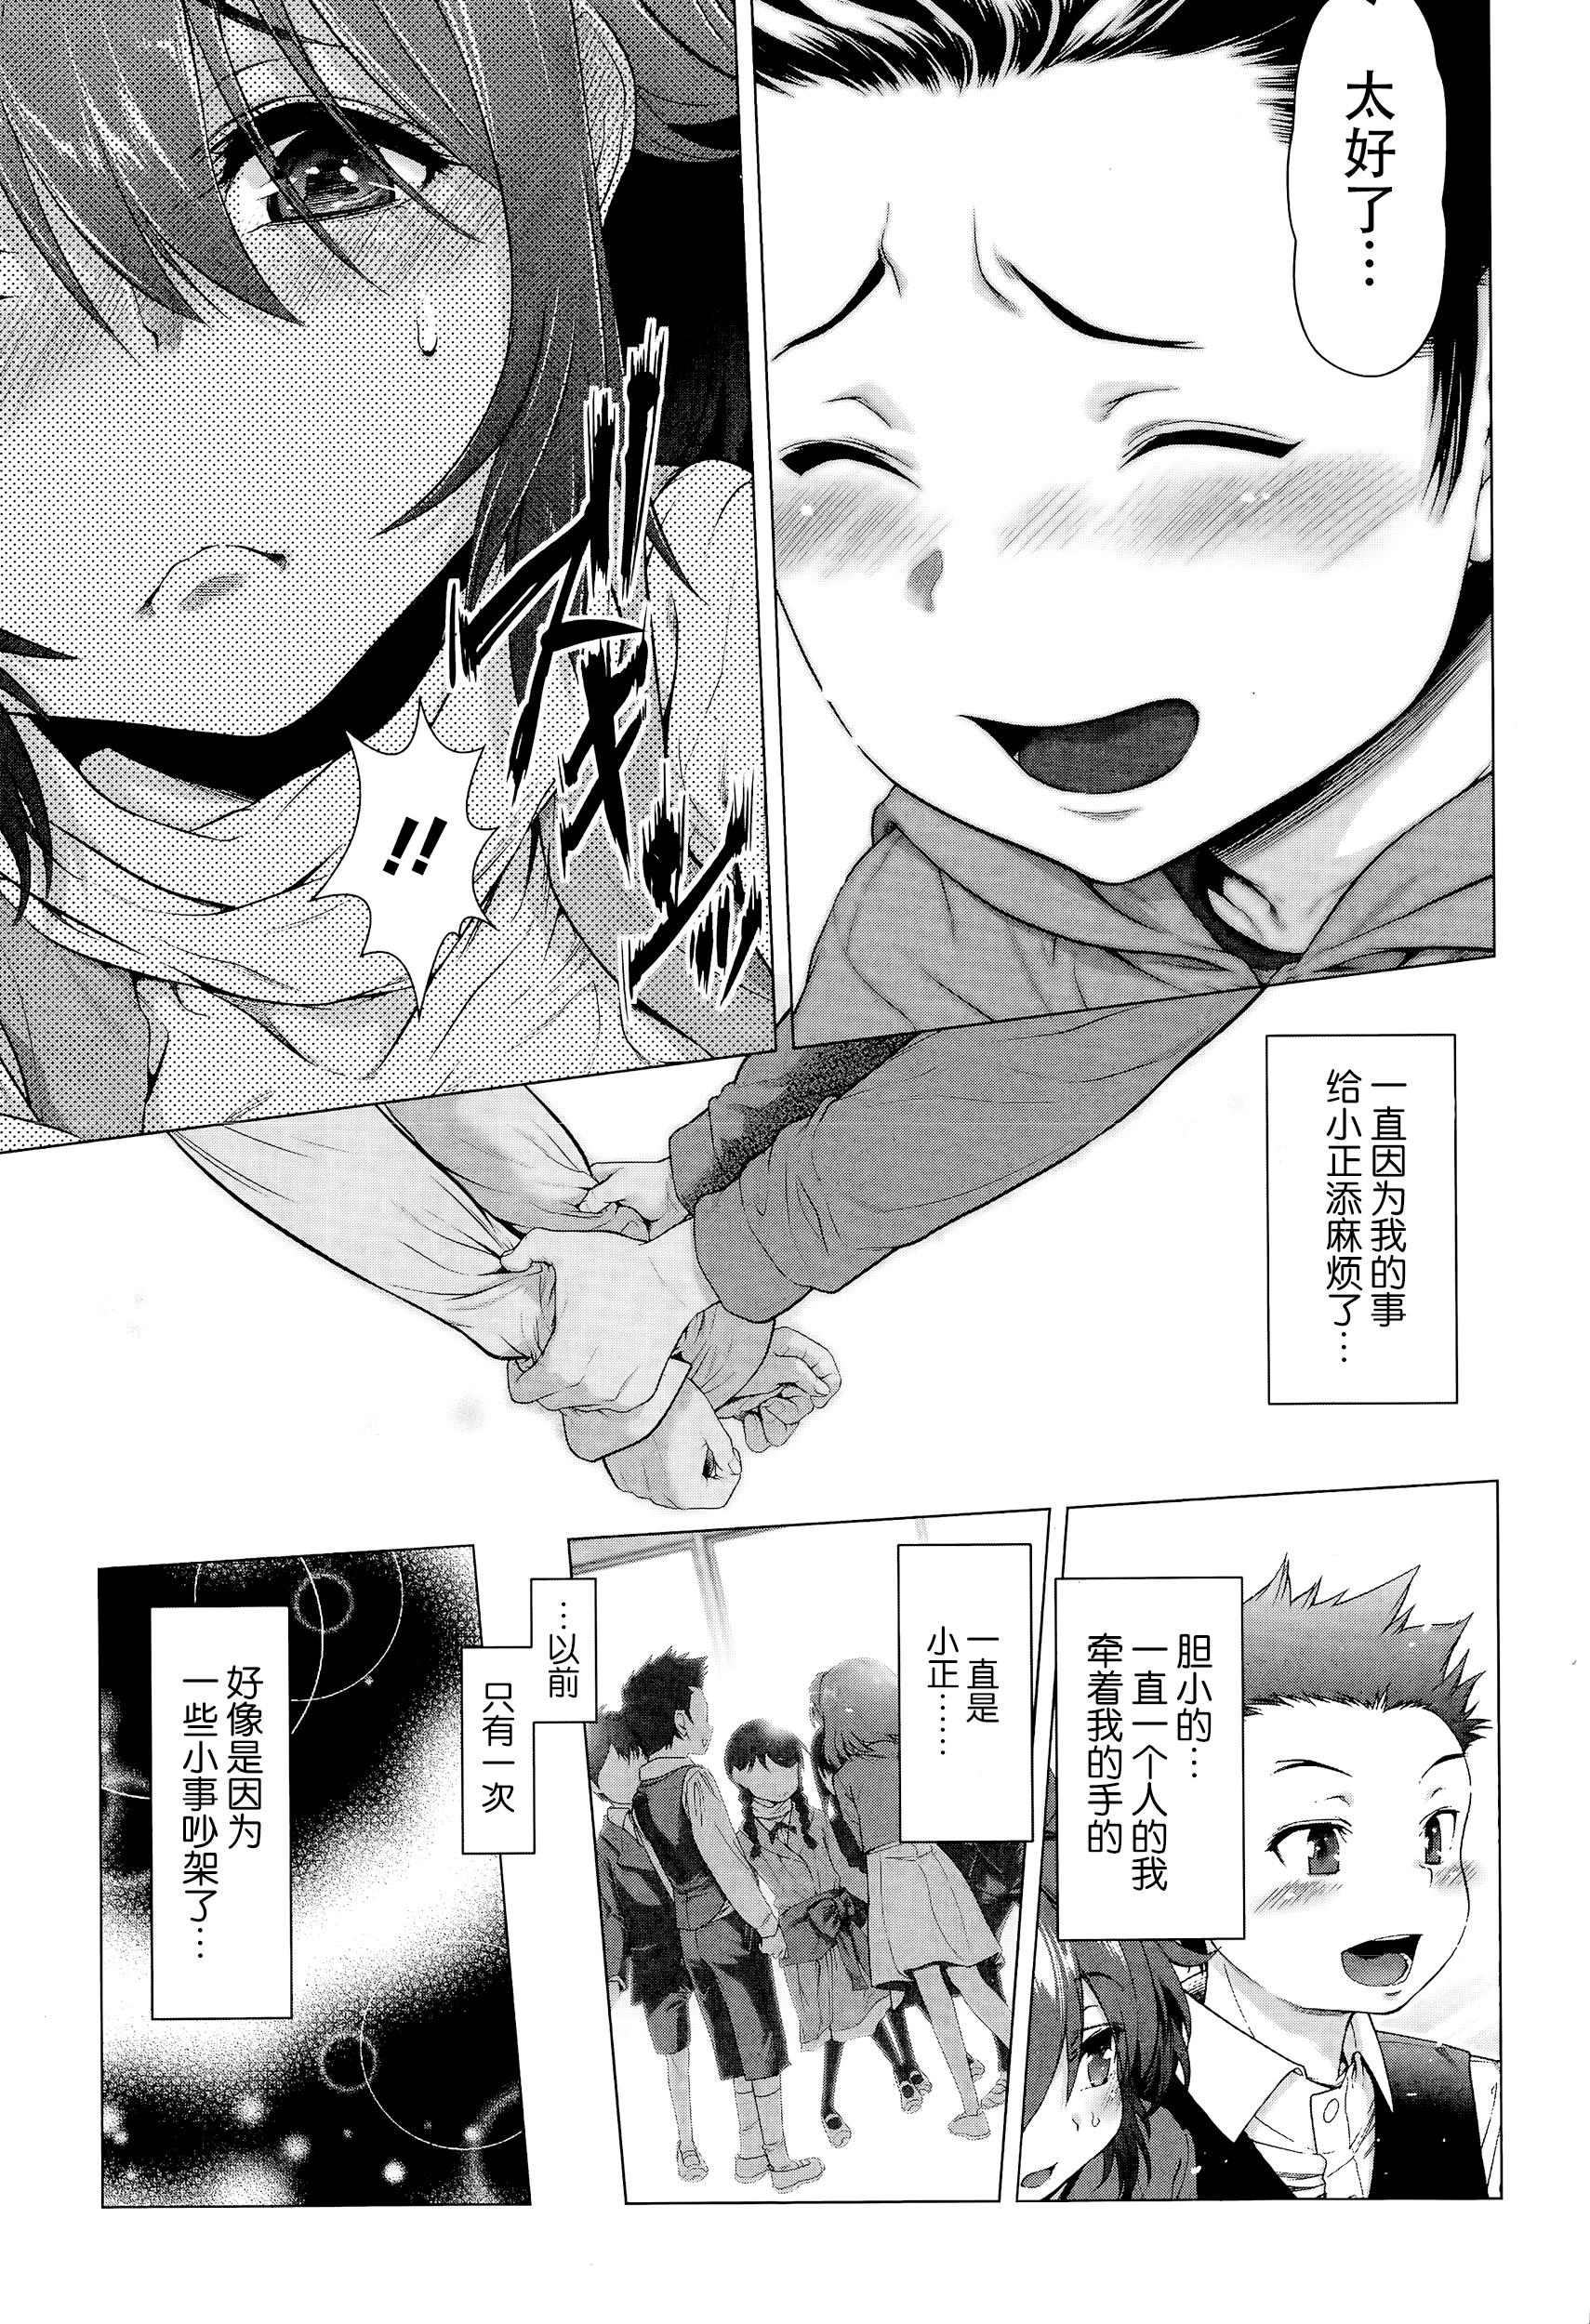 Chinpotsuki! Ijimerarekko ch.1-5 43